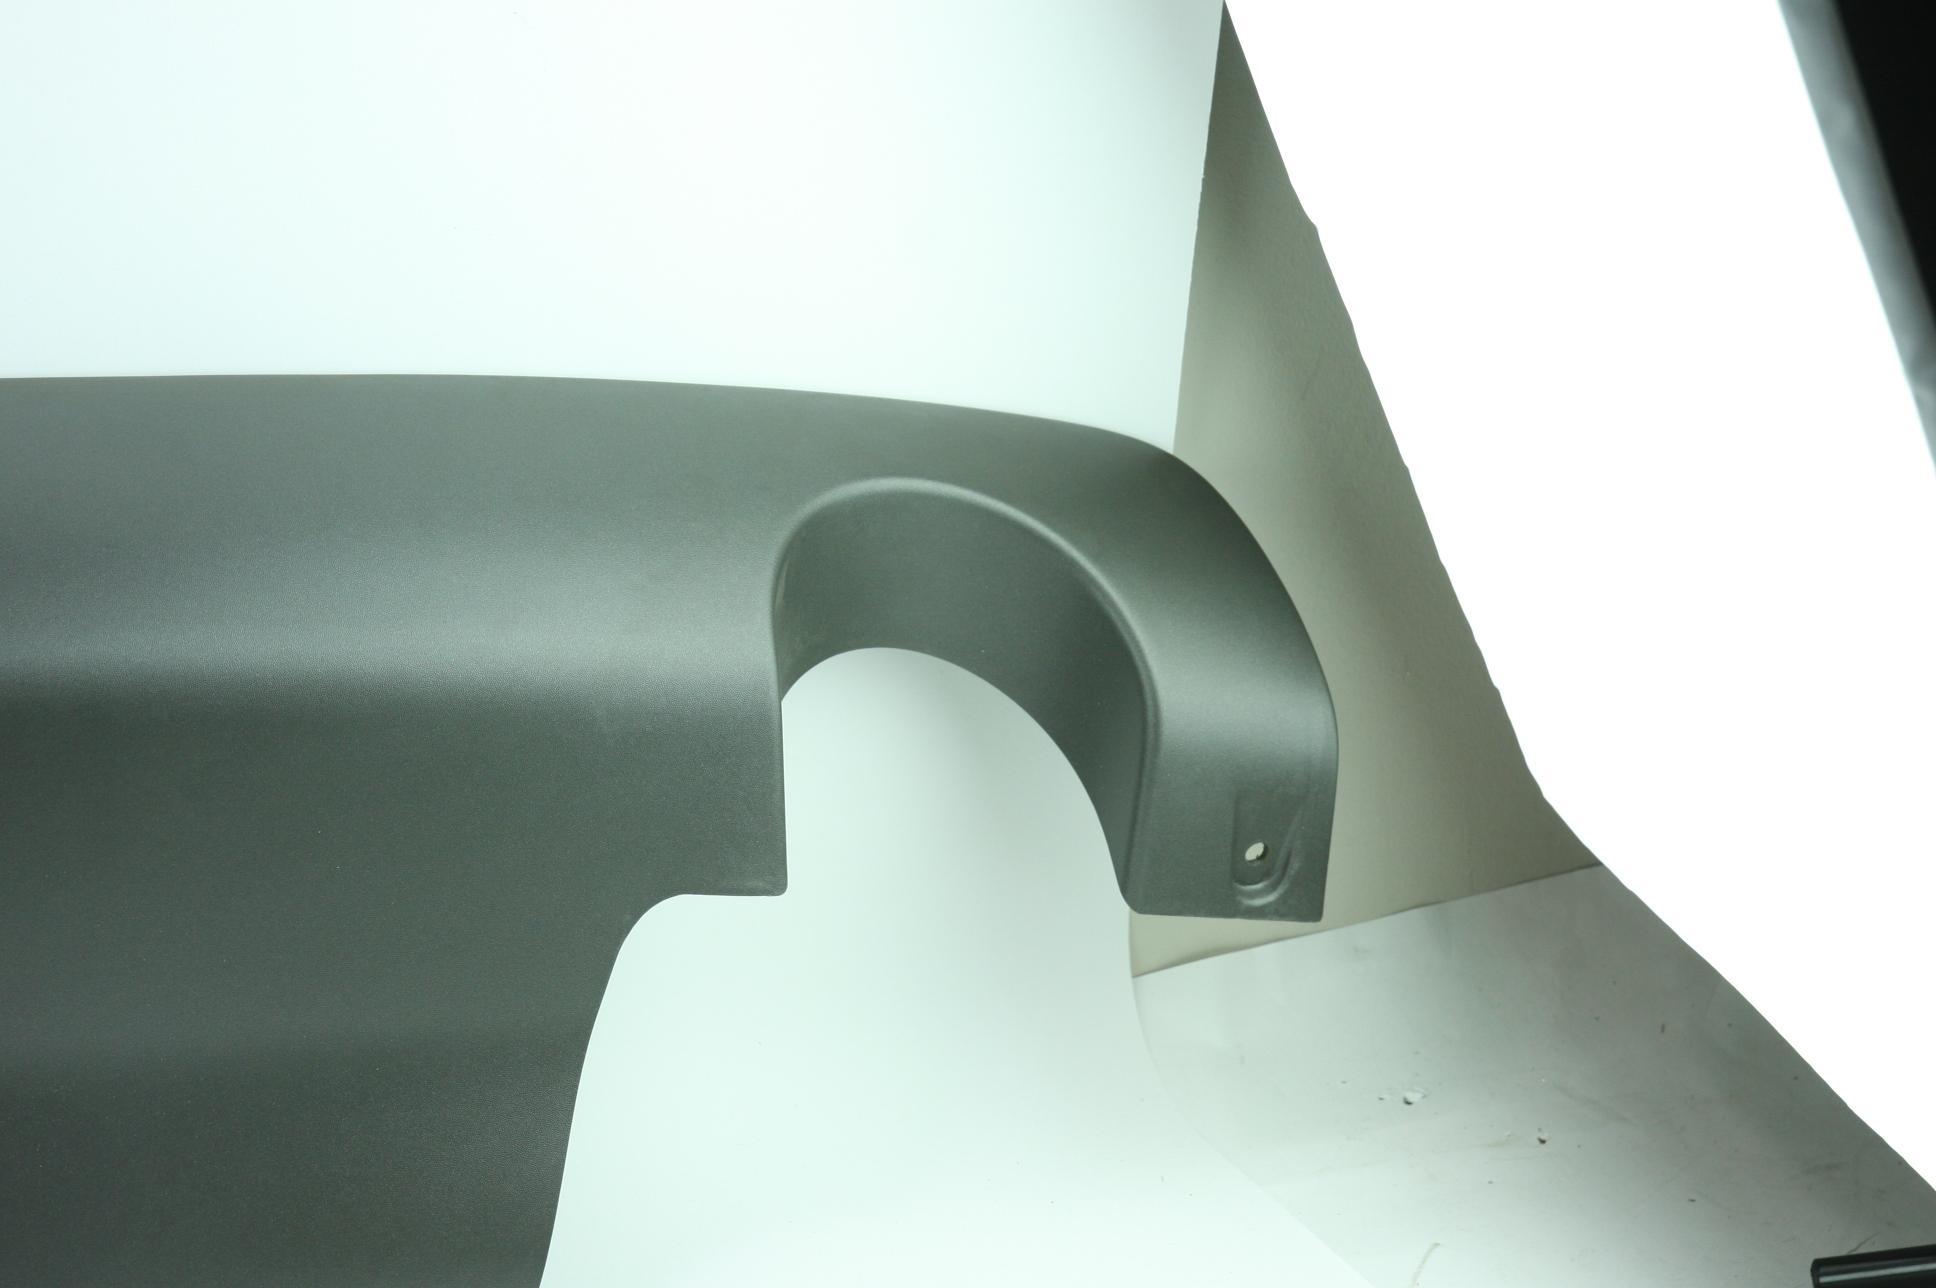 * New Genuine OEM GM 25747970 Cadillac 05-07 STS Rear Bumper Insert Panel NIP - image 6